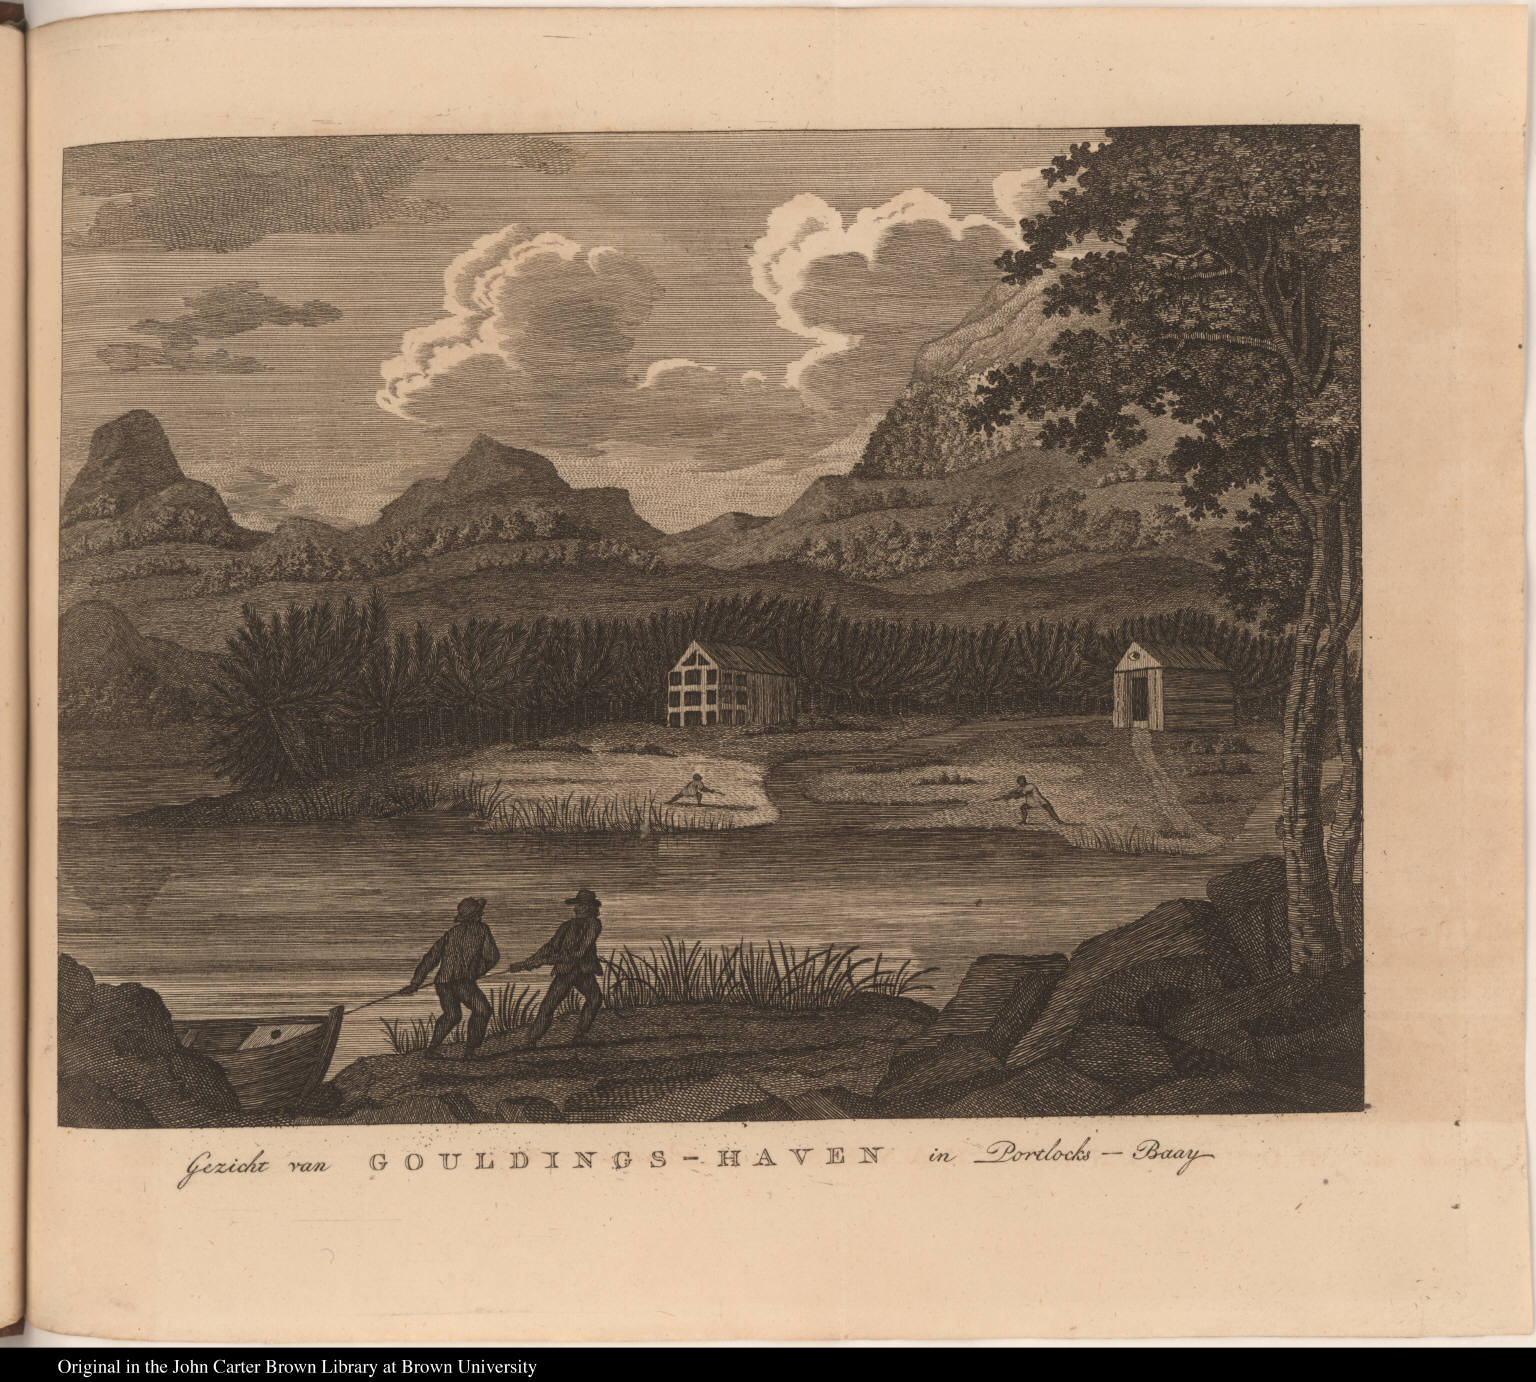 Gezicht van Gouldings-Haven in Portlocks -- Baay